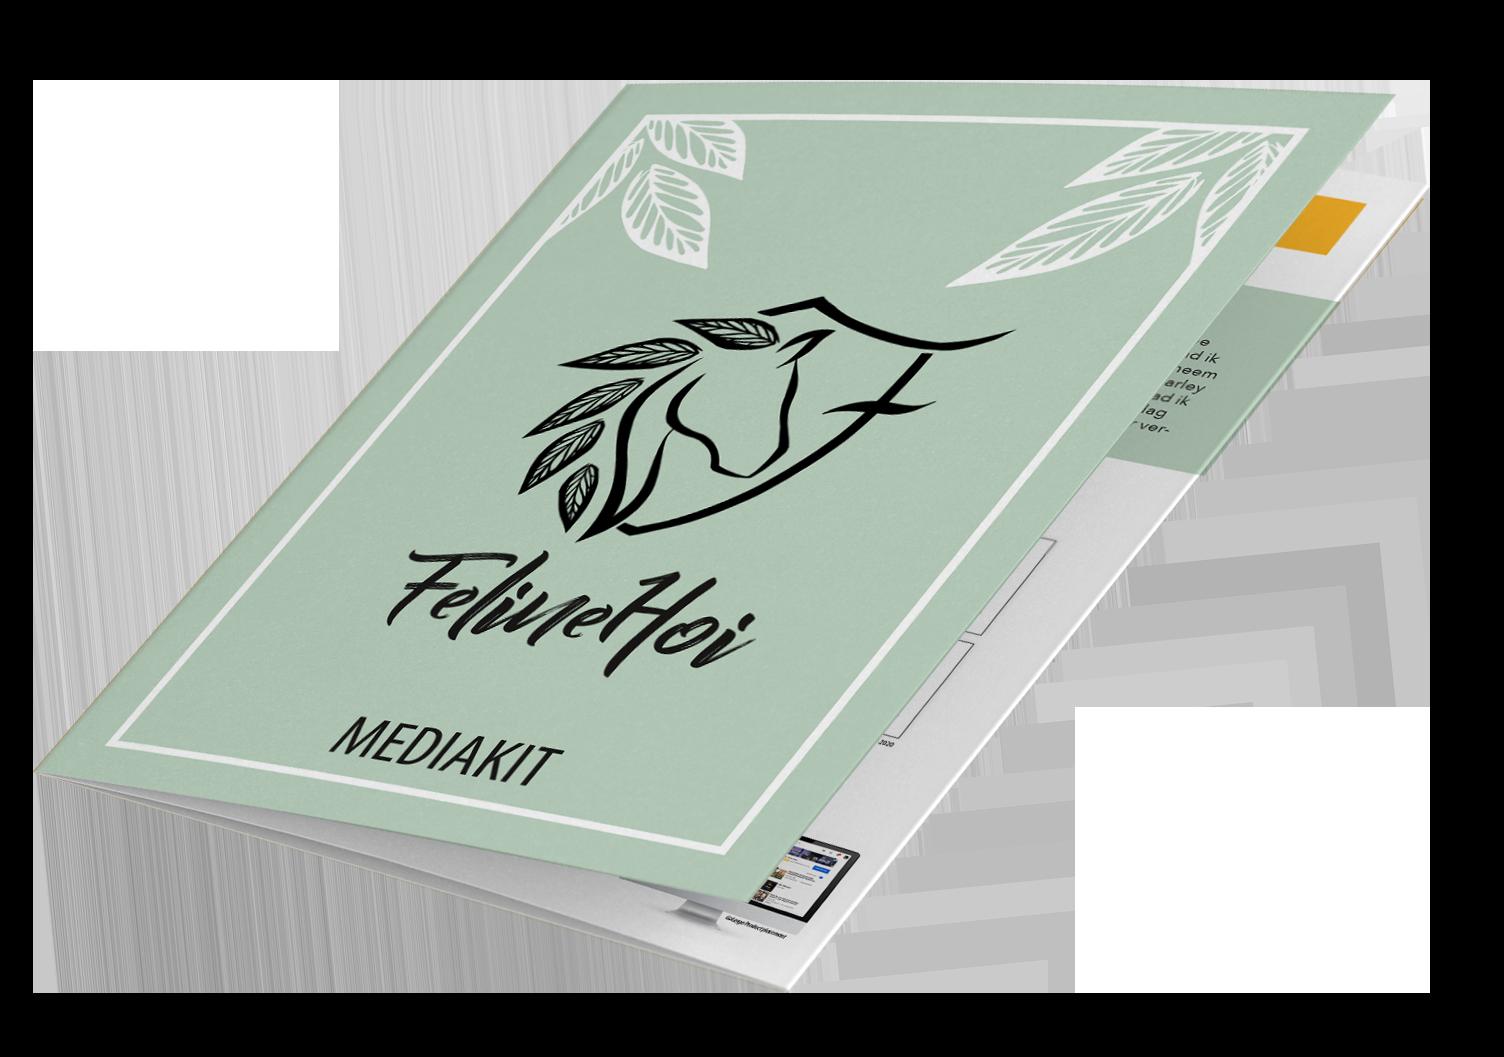 MediaKit Felinehoi